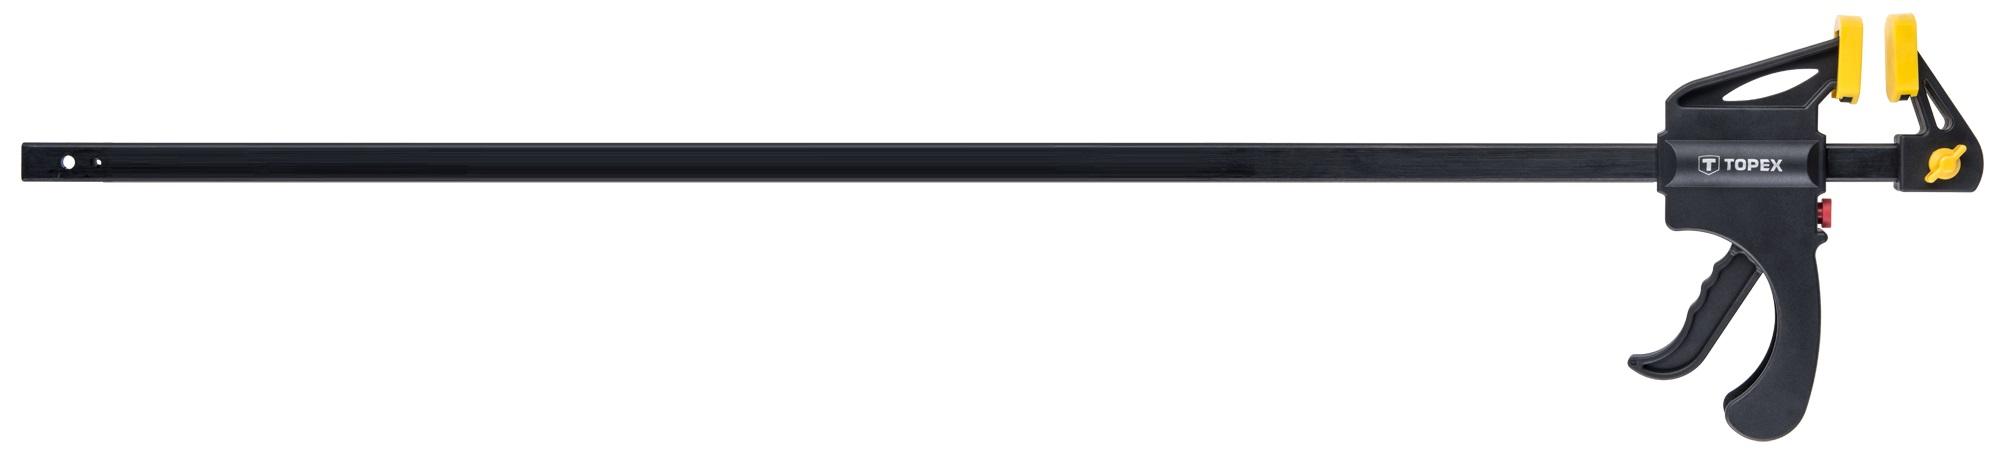 Topex 12A590 Струбцина автоматична, 900 x 60 мм